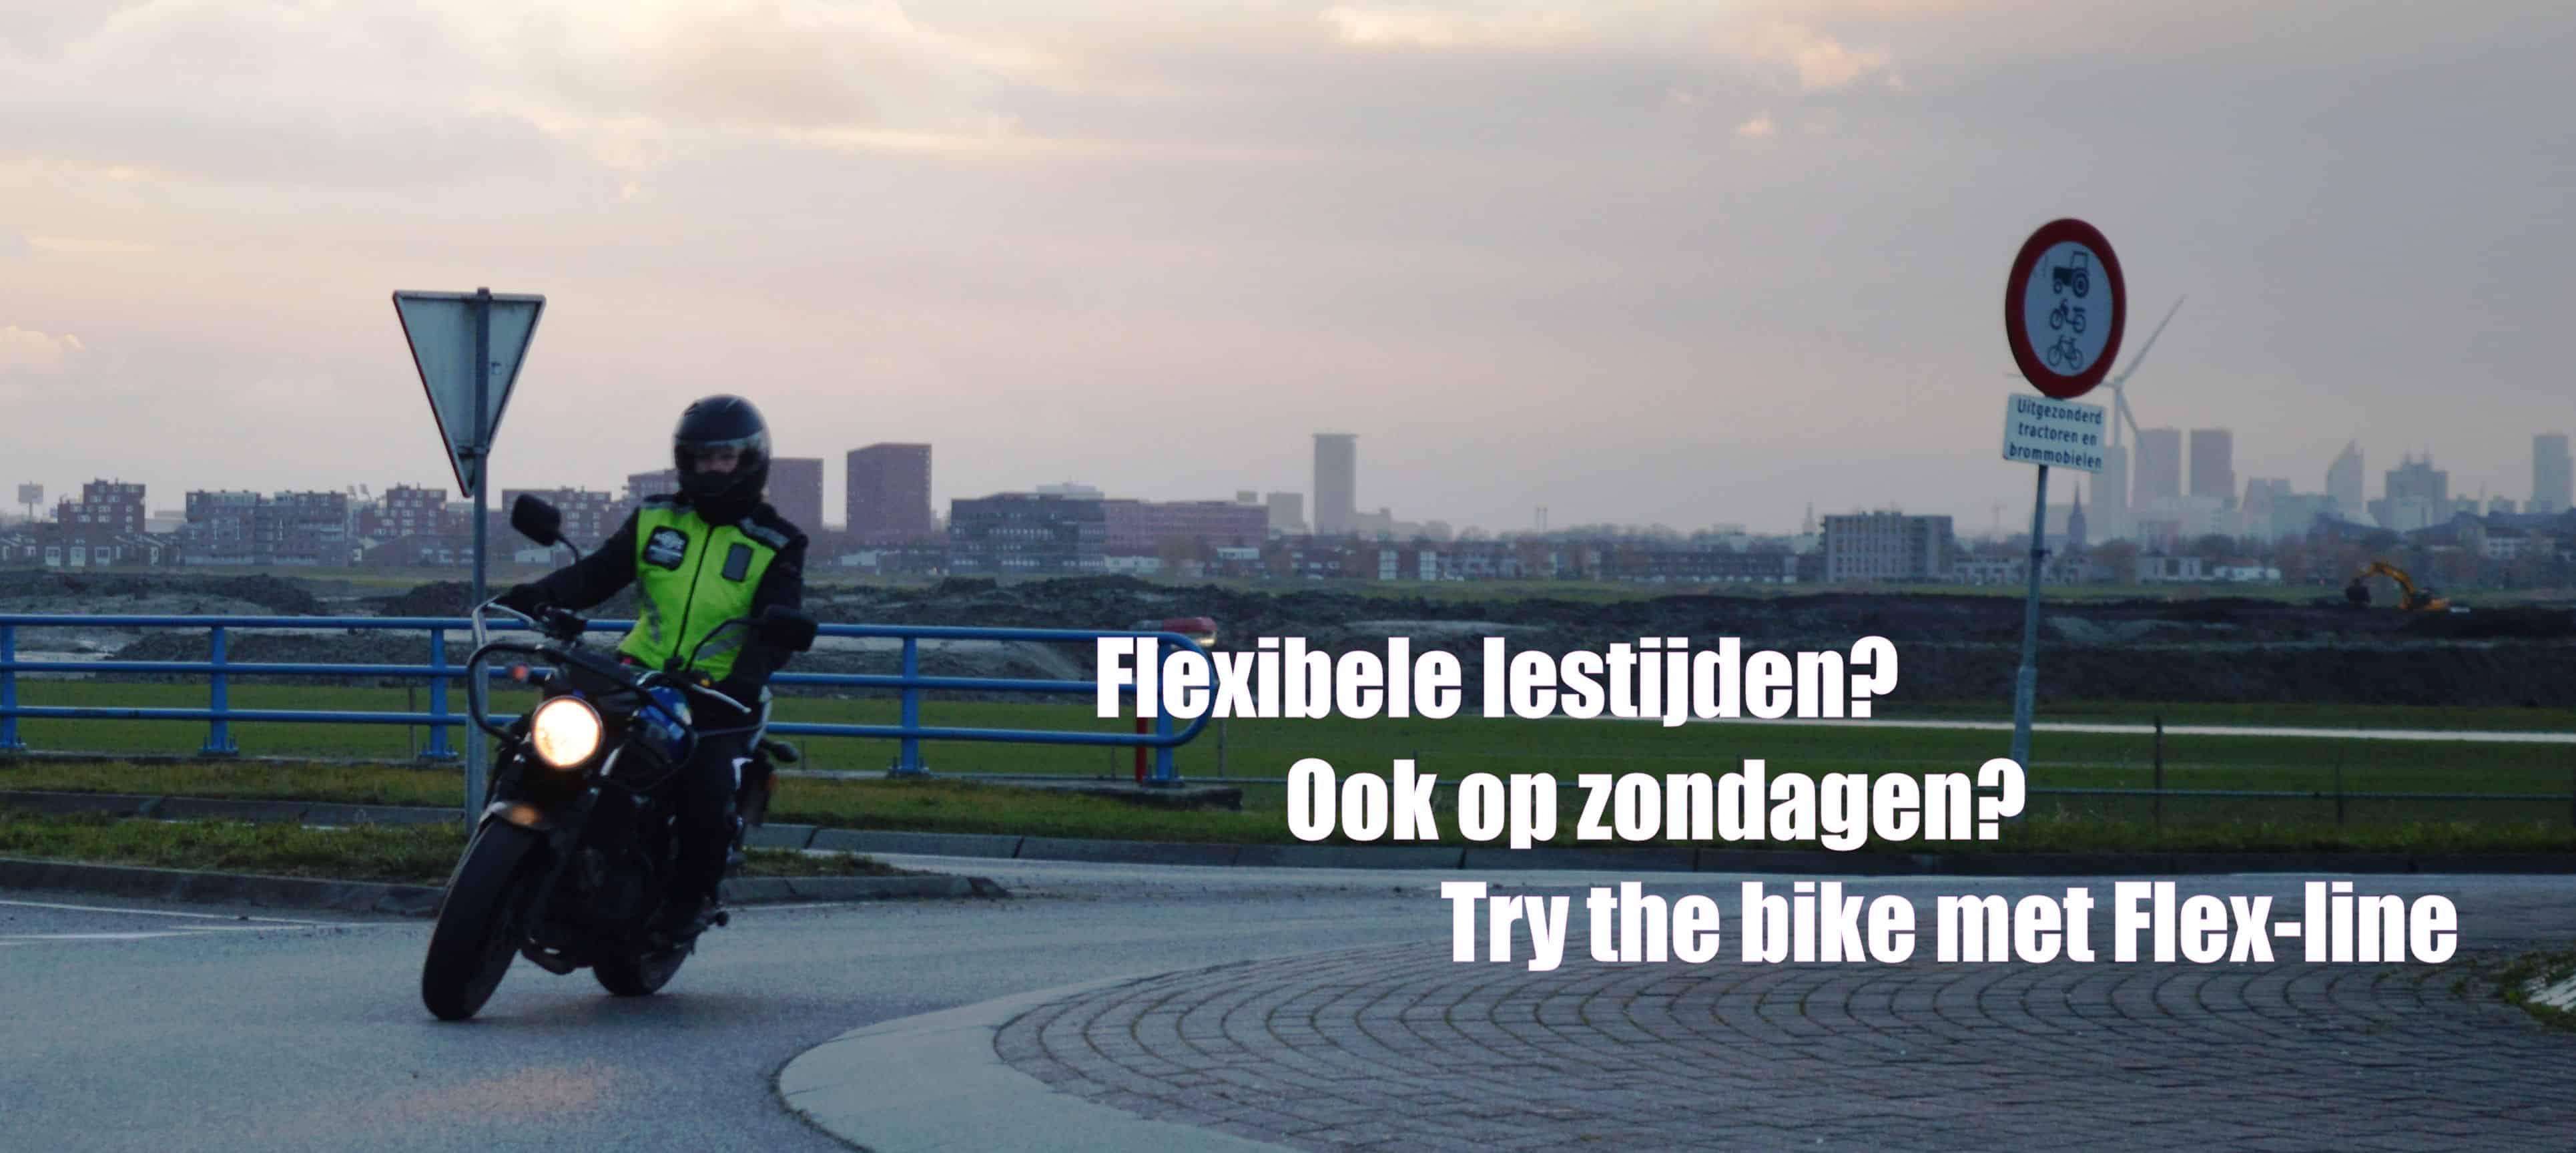 Flexline_trythebike